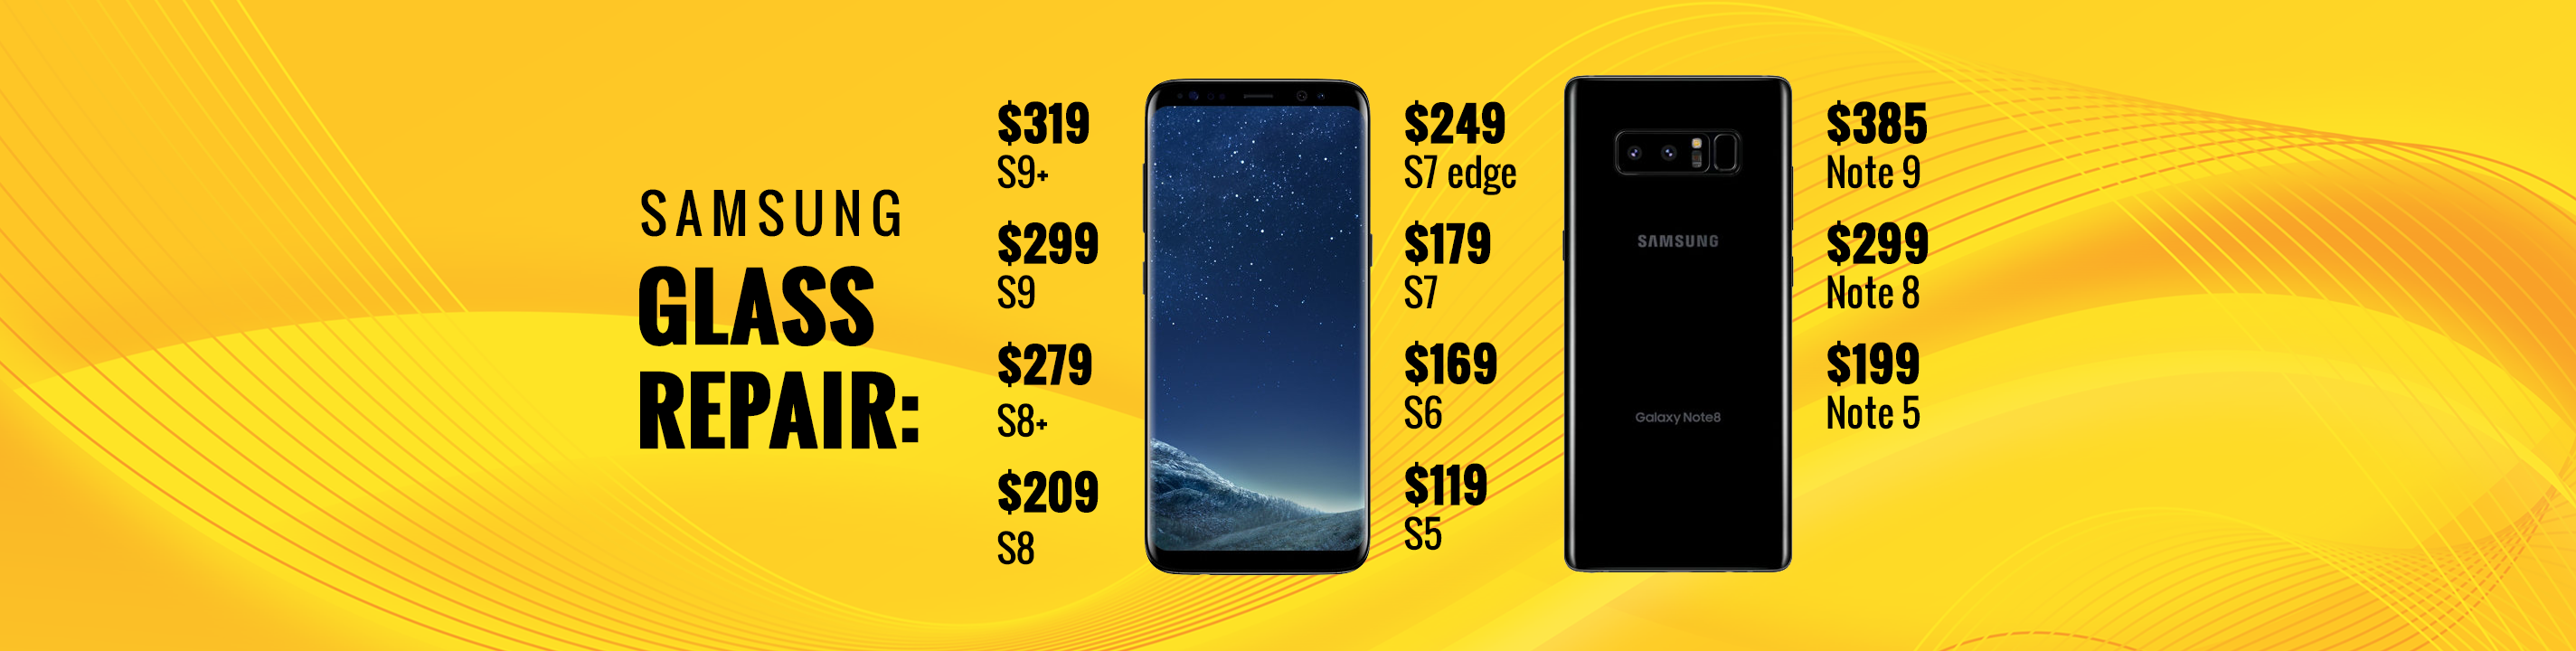 samsung-pricing-banner-10.19.18